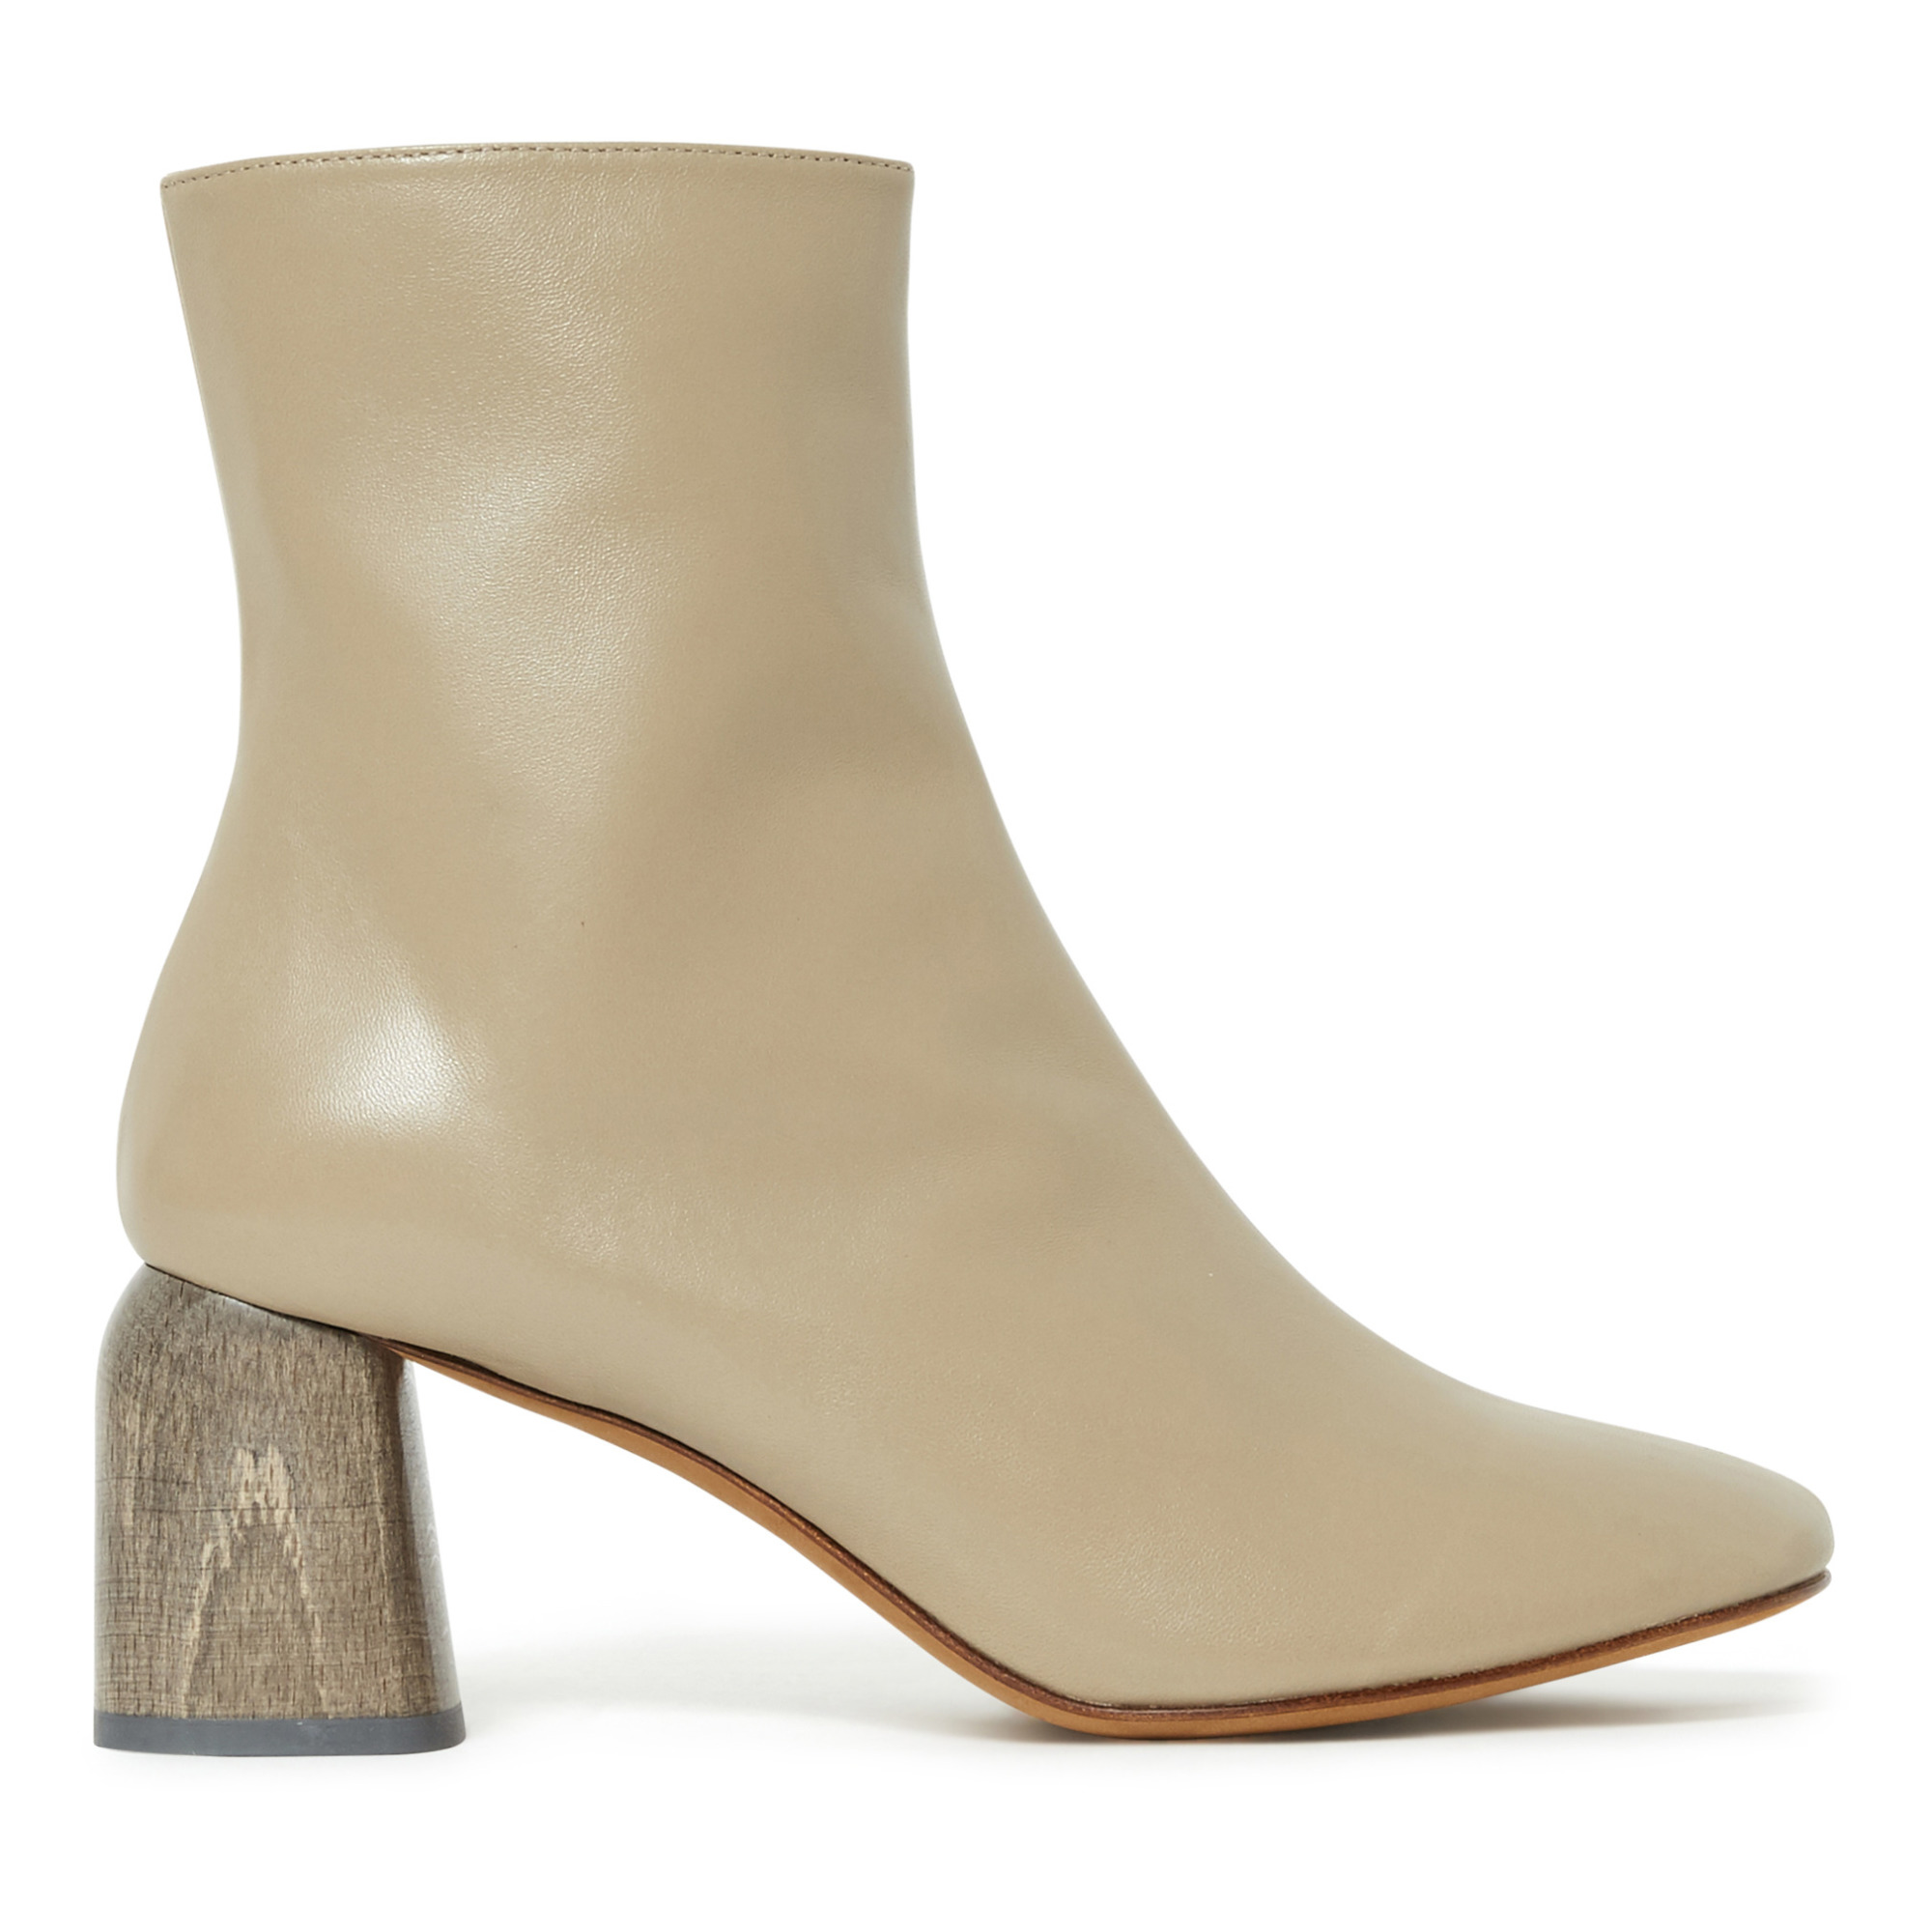 Georgia Ankle Boots